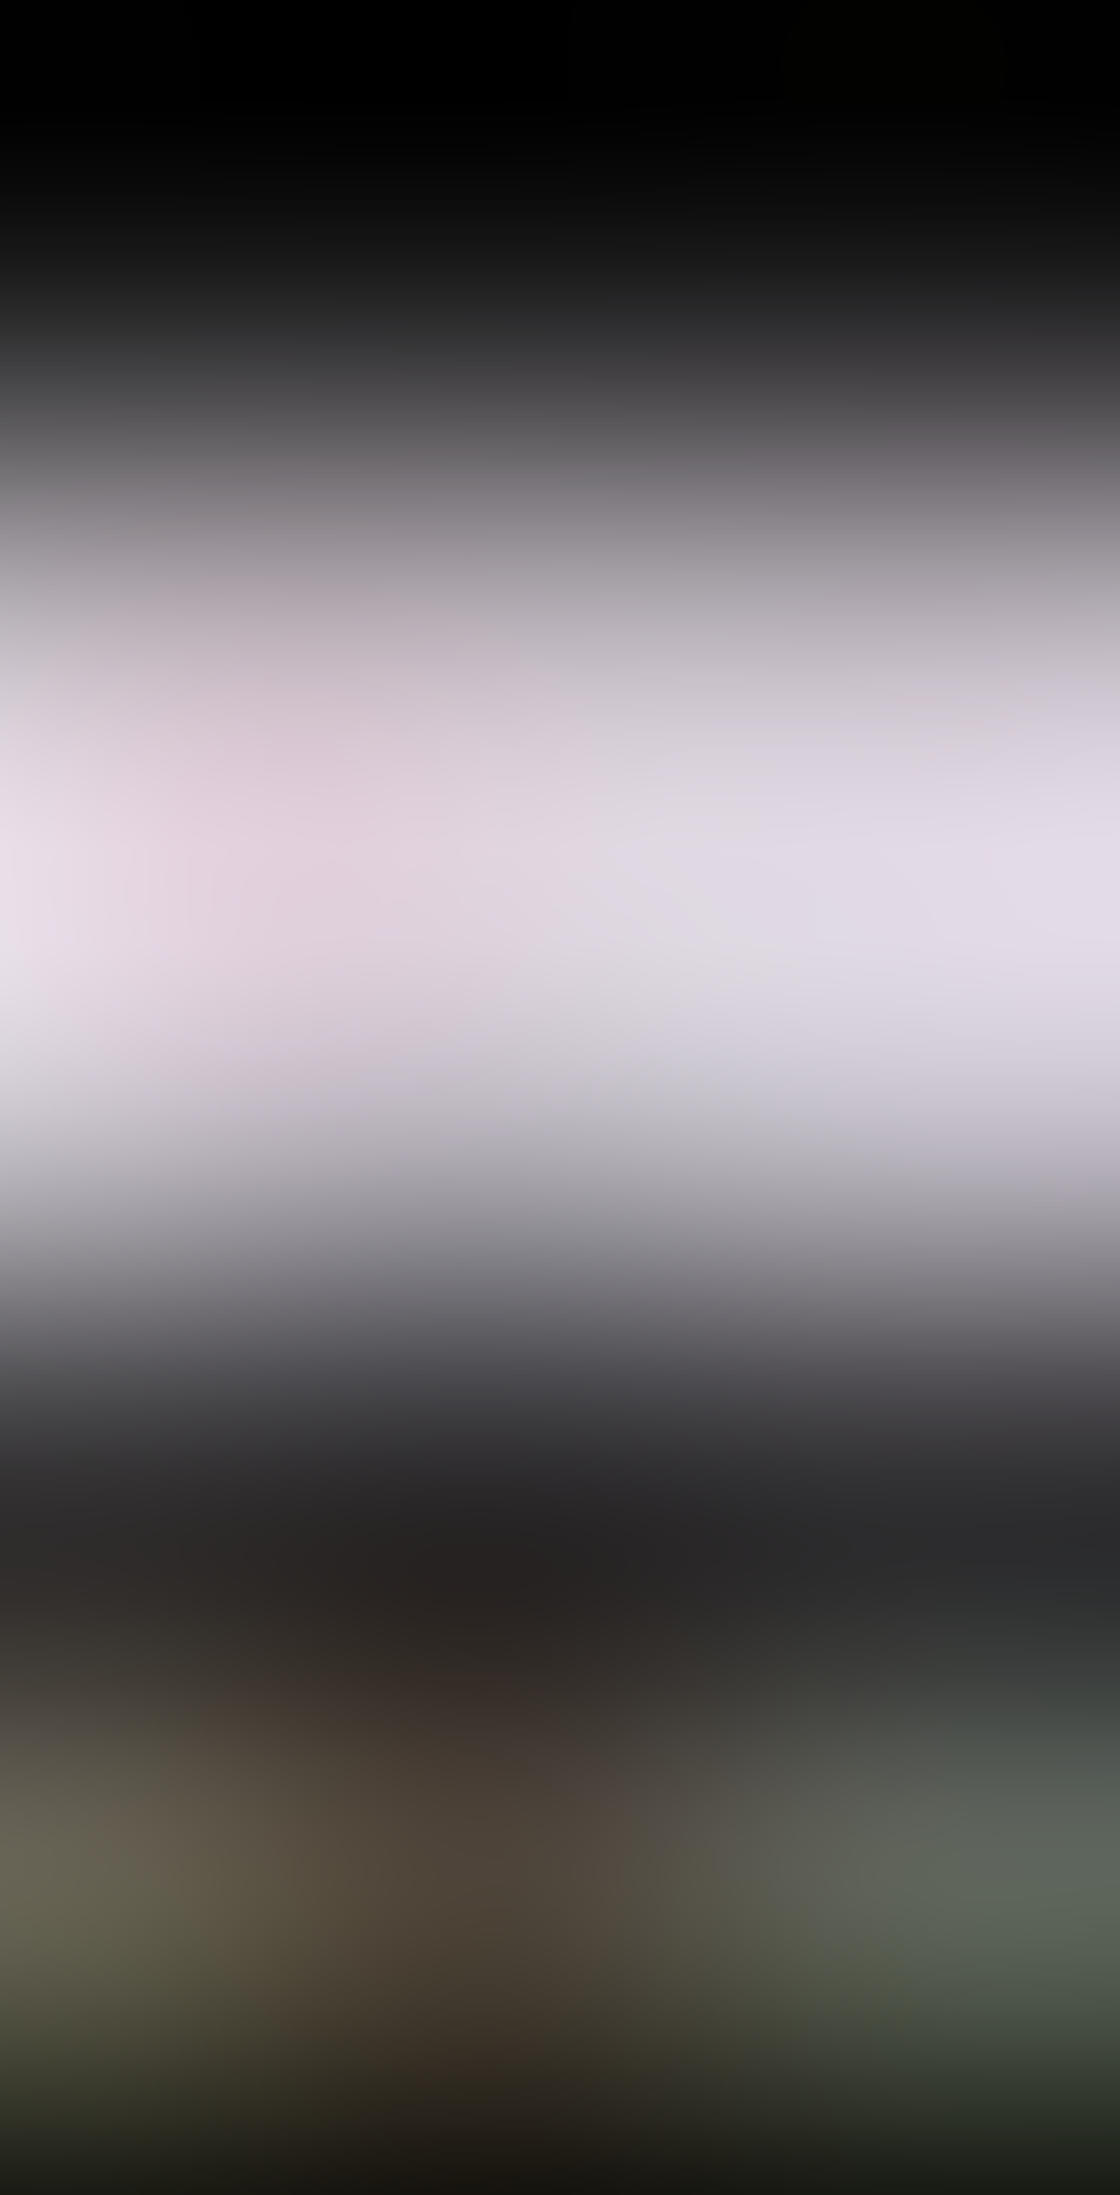 Vsco filters 6